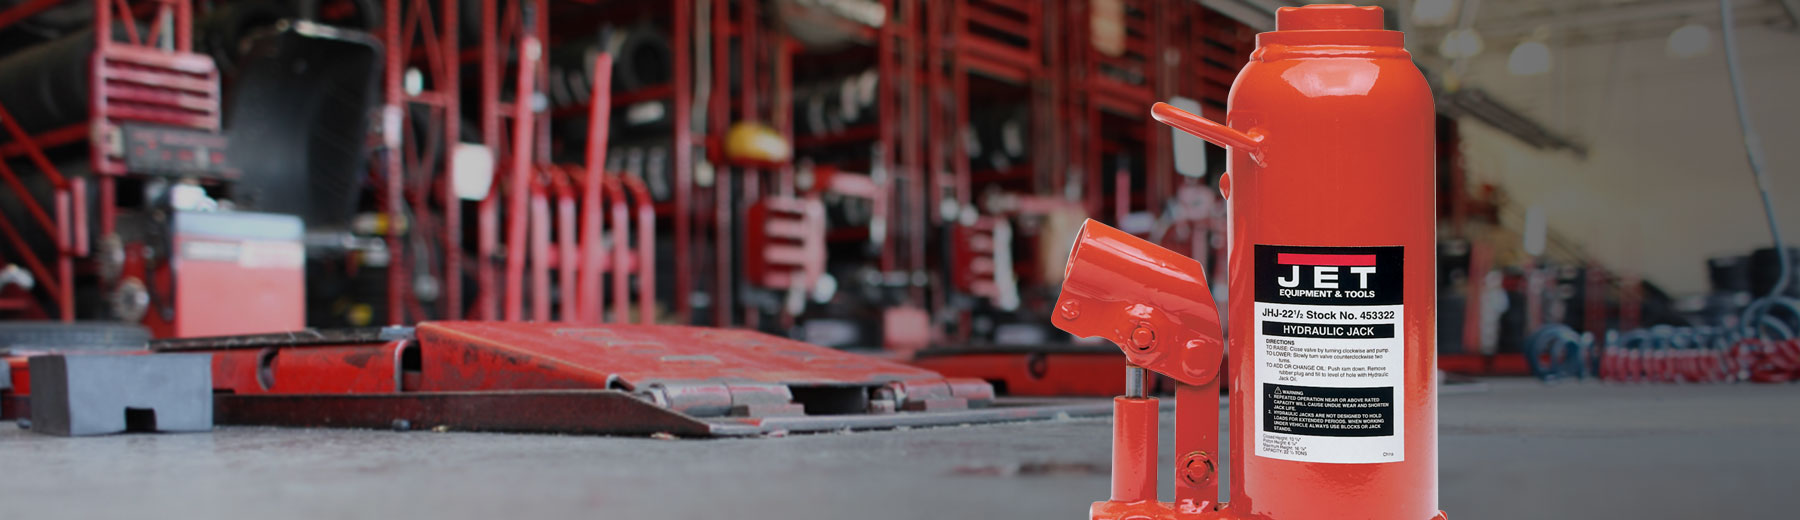 Hydraulic Bottle Jack Schematic Electrical Wiring Diagrams Floorjackpartslist Floor Repair Diagram Car Tuning Jet Jacks For Lifting Replacement Parts